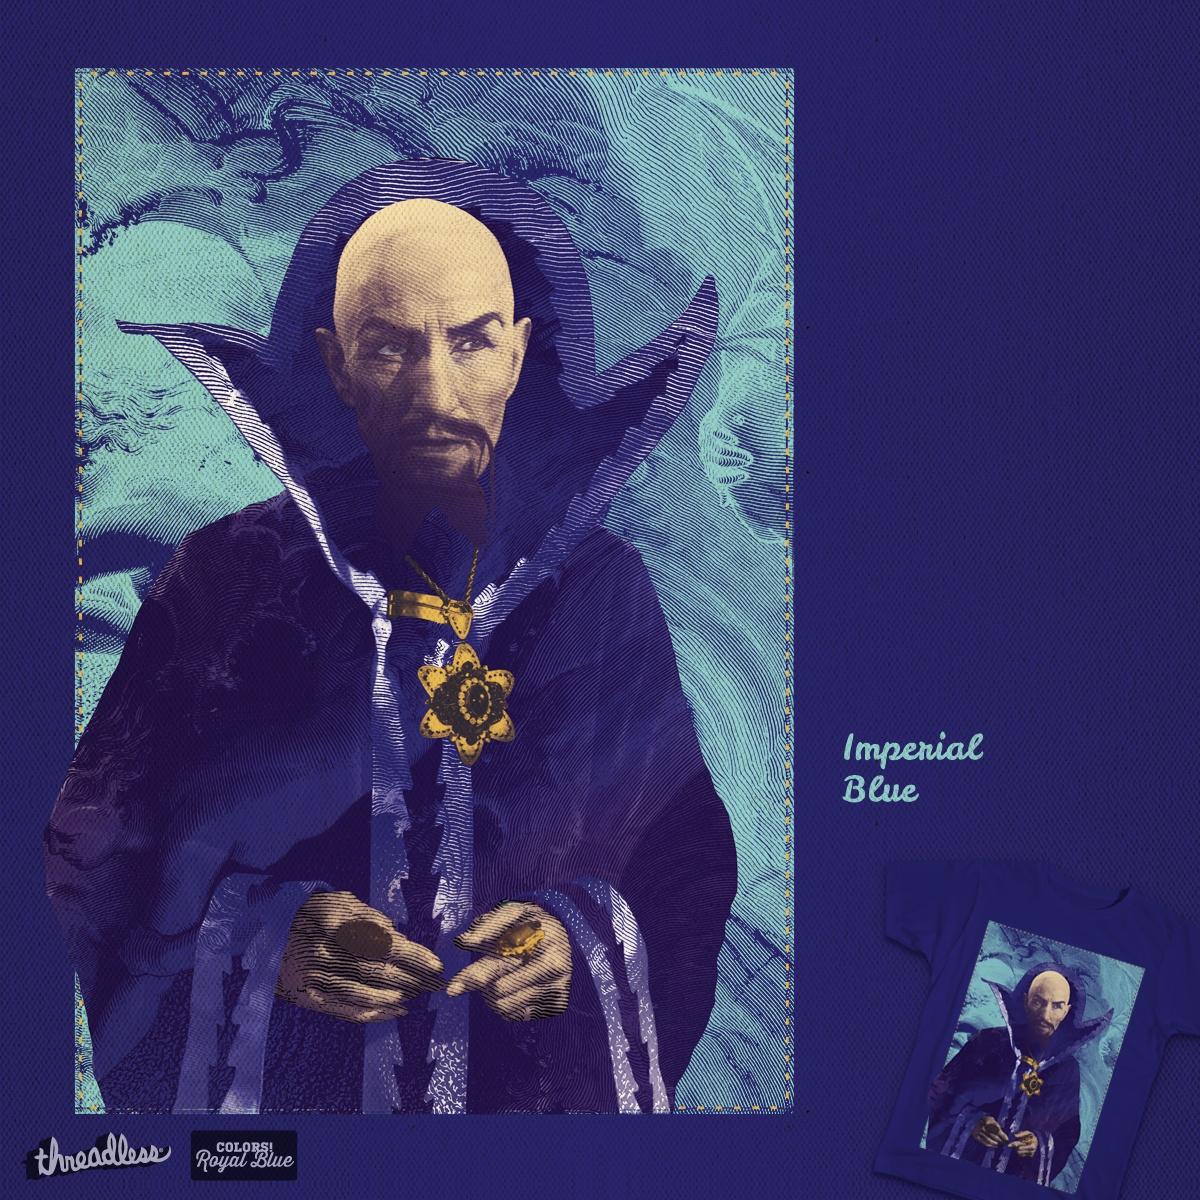 Imperial Blue by KosMarkatos on Threadless